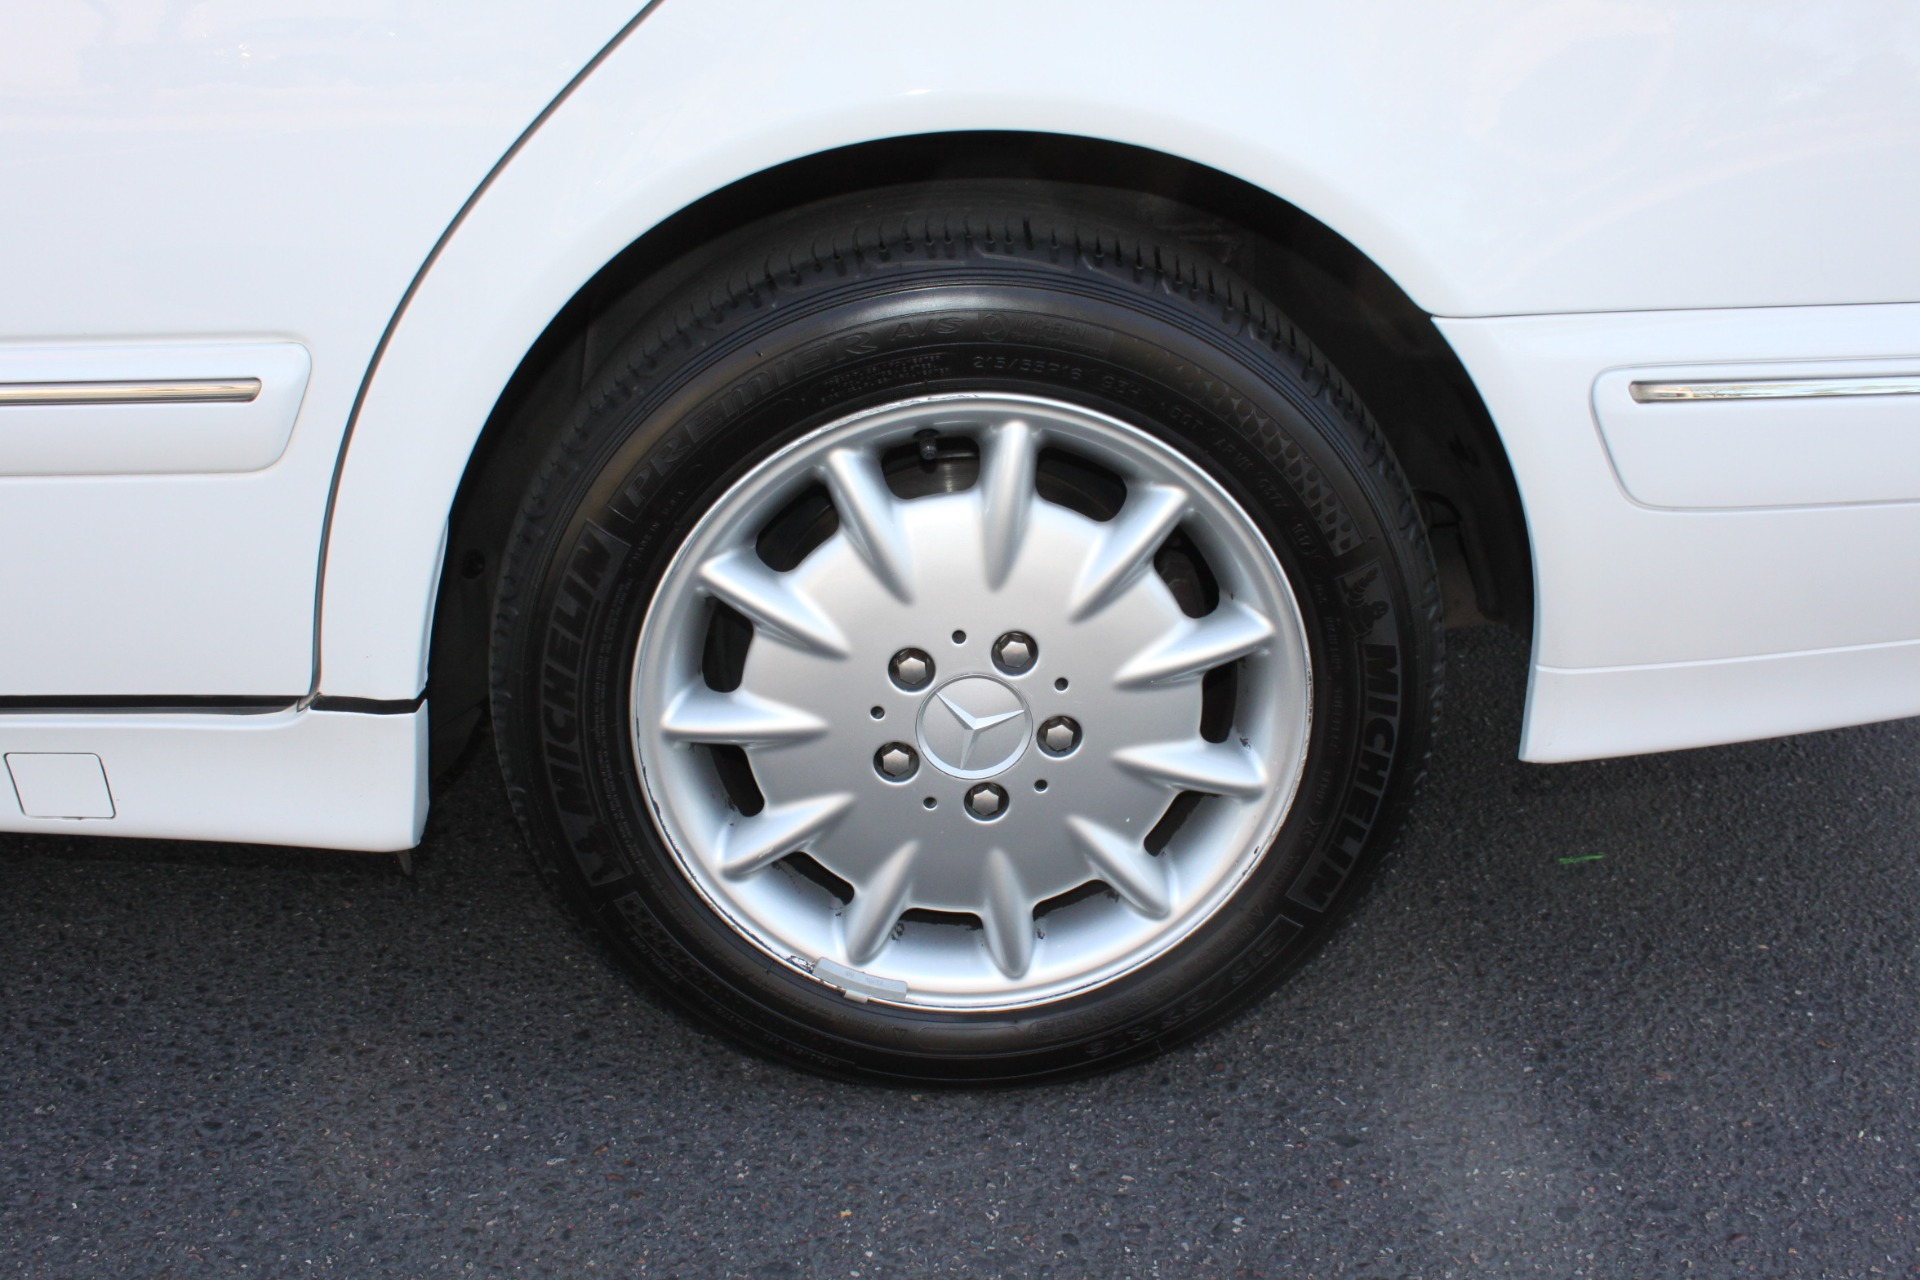 Used-2000-Mercedes-Benz-E-Class-Wagon-XJ